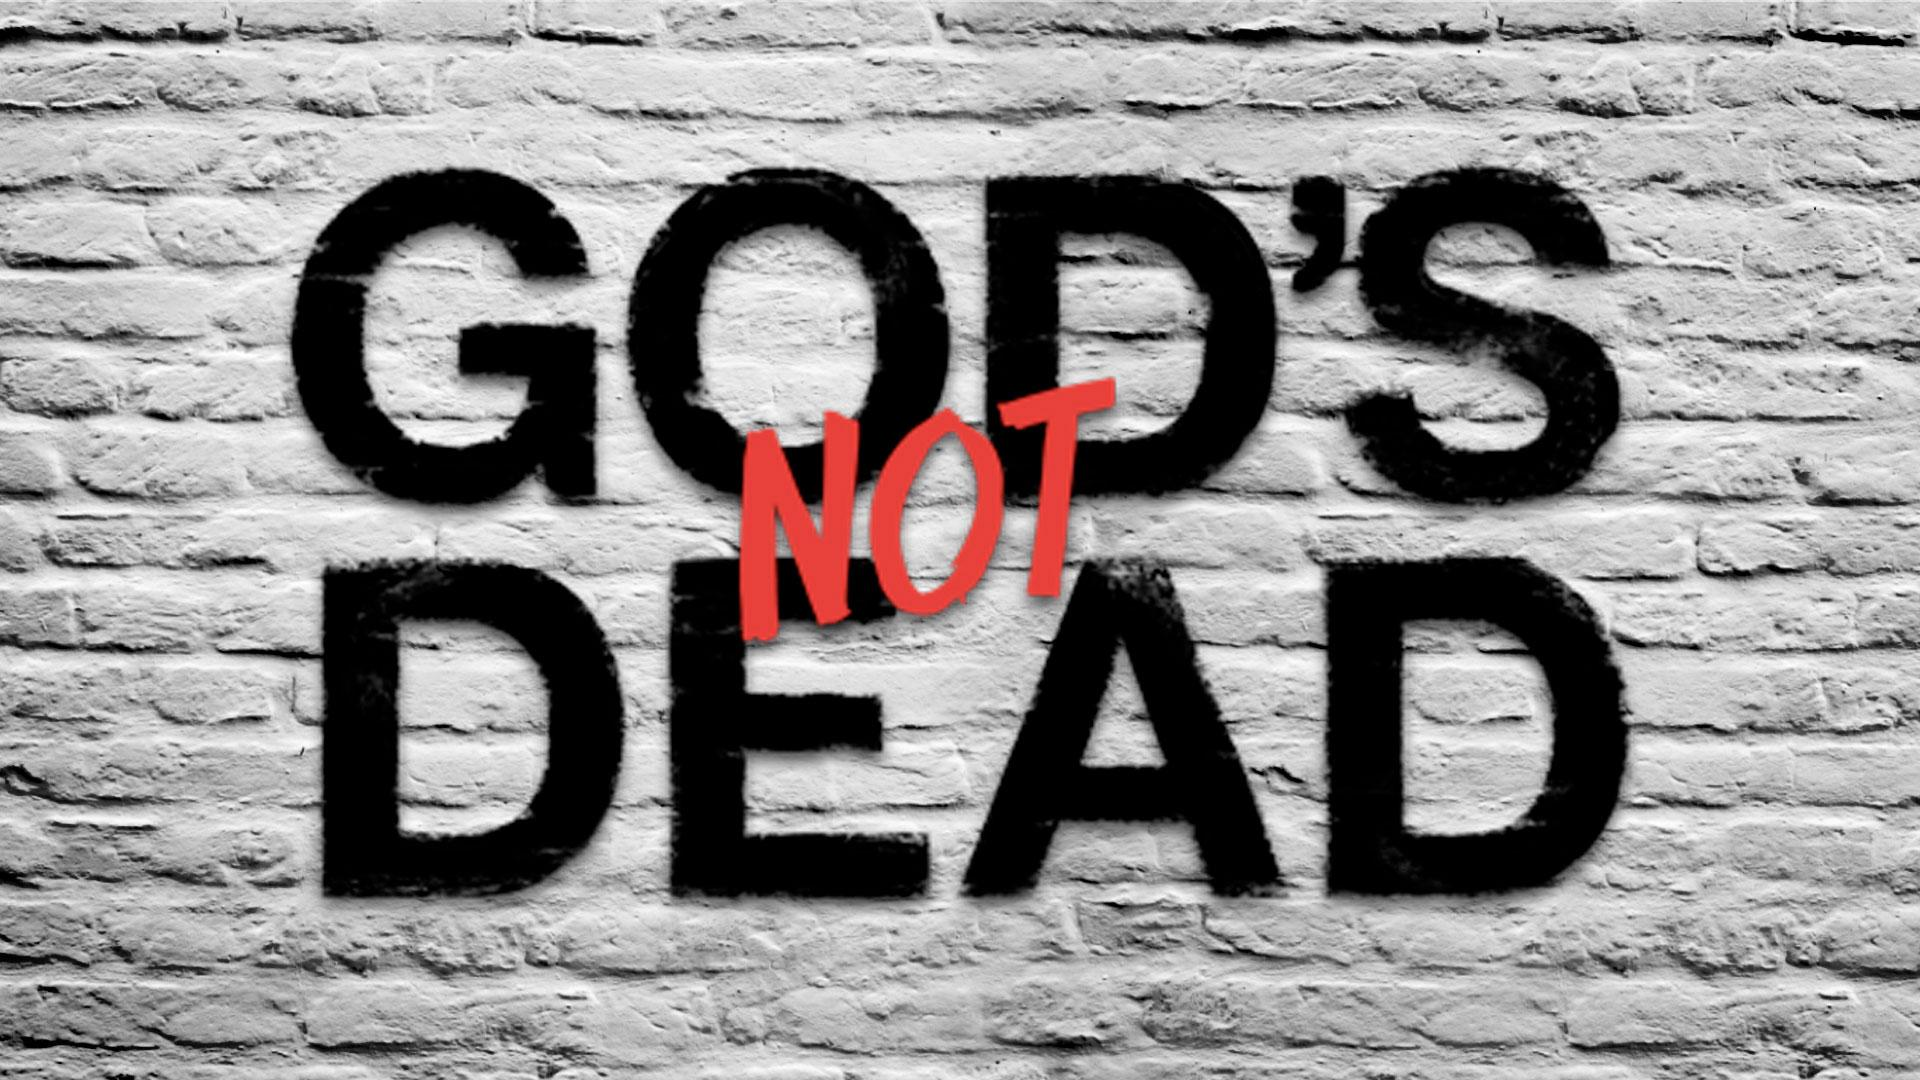 gods not dead 2 full movie download mp4